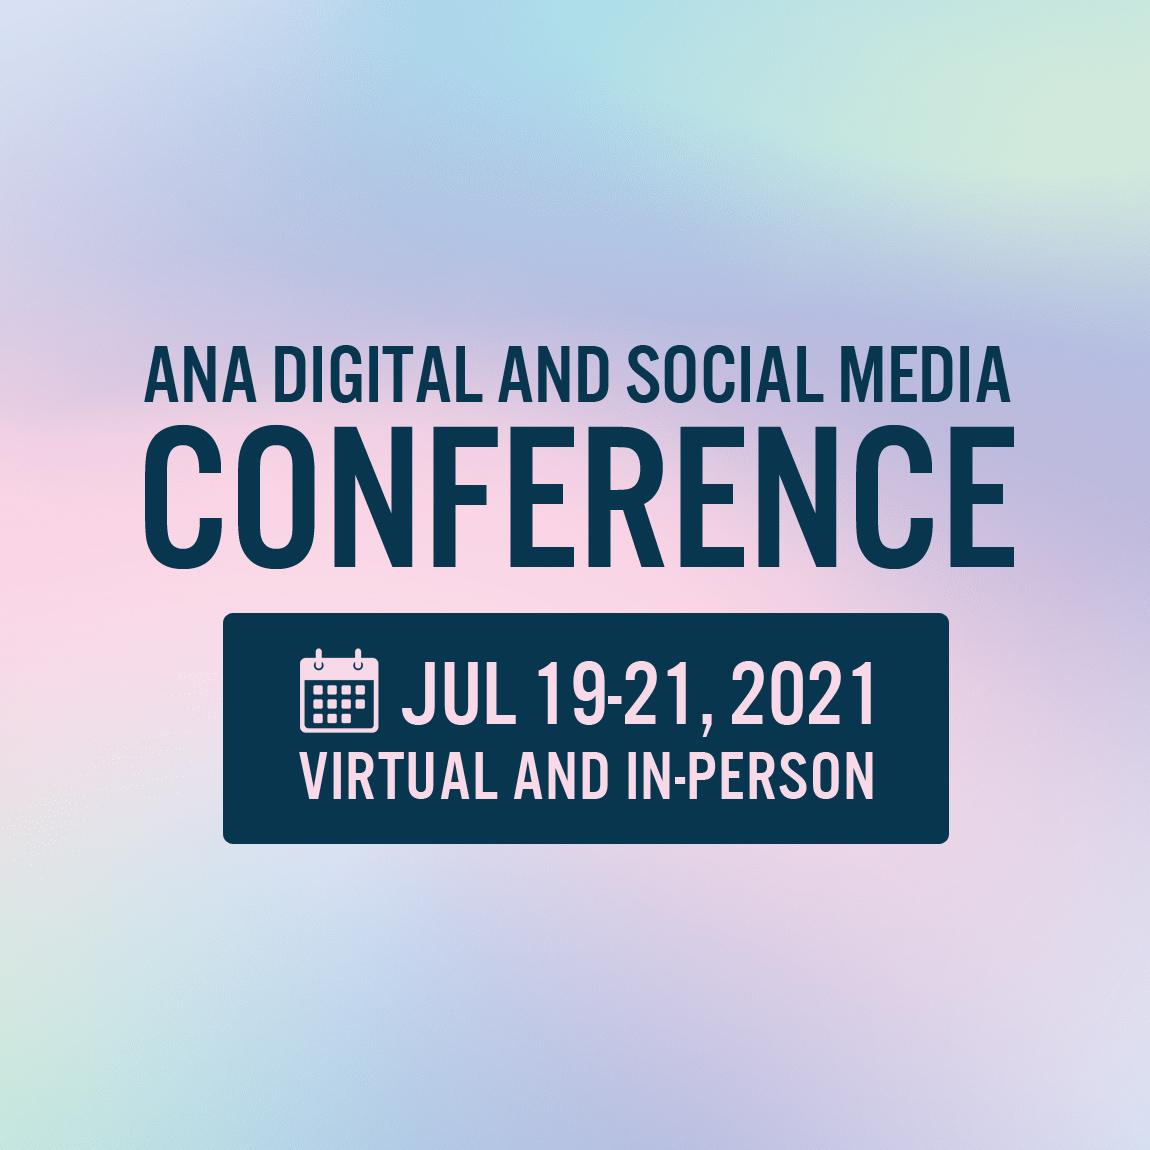 ANA Digital and Social Media Conference